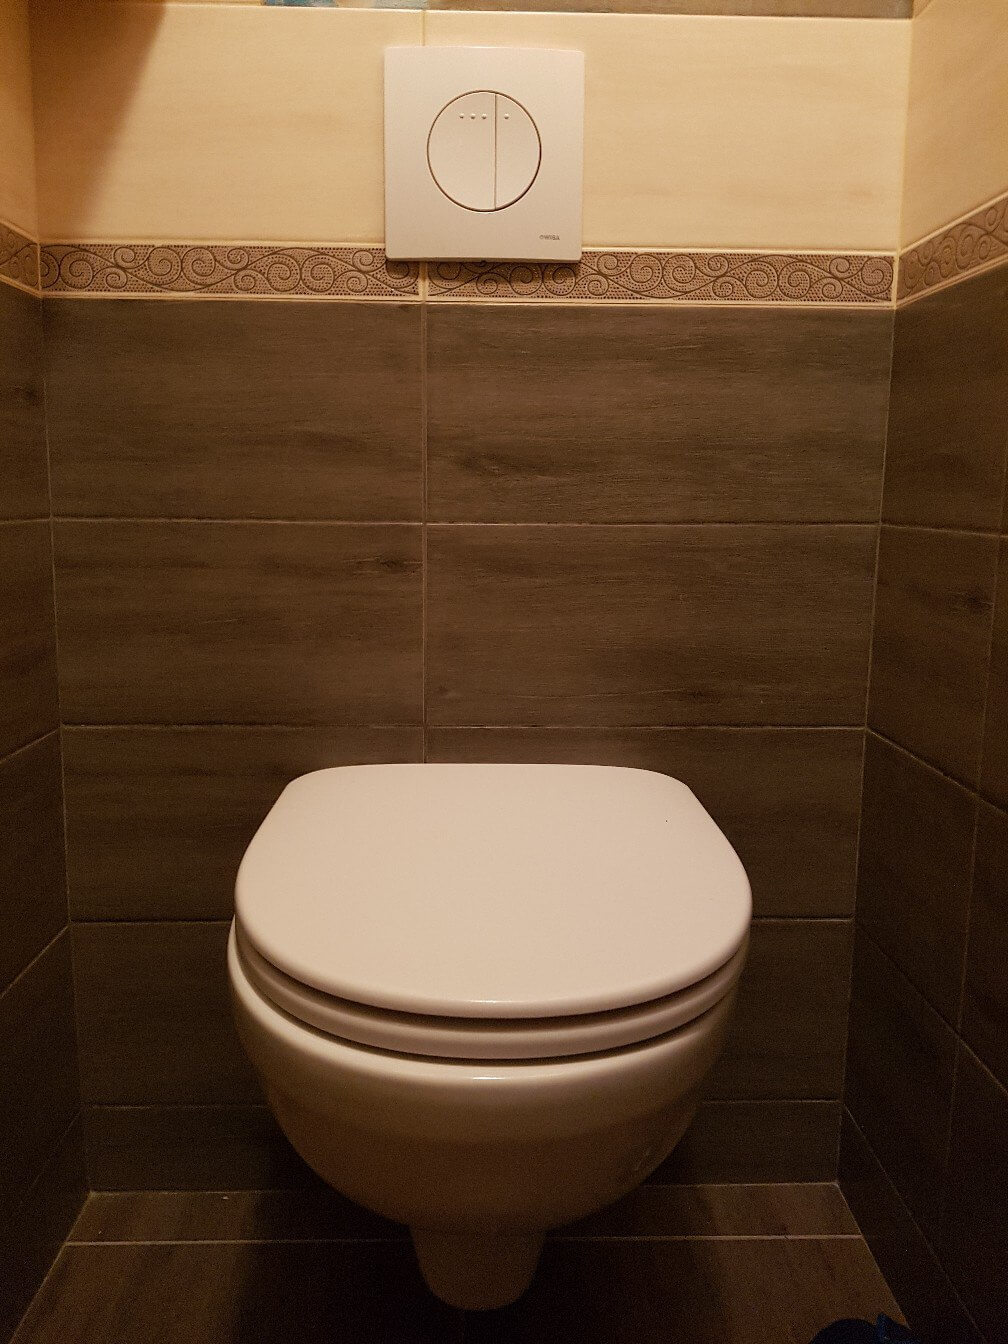 20182302-remont-installacii-wisa-1.jpg